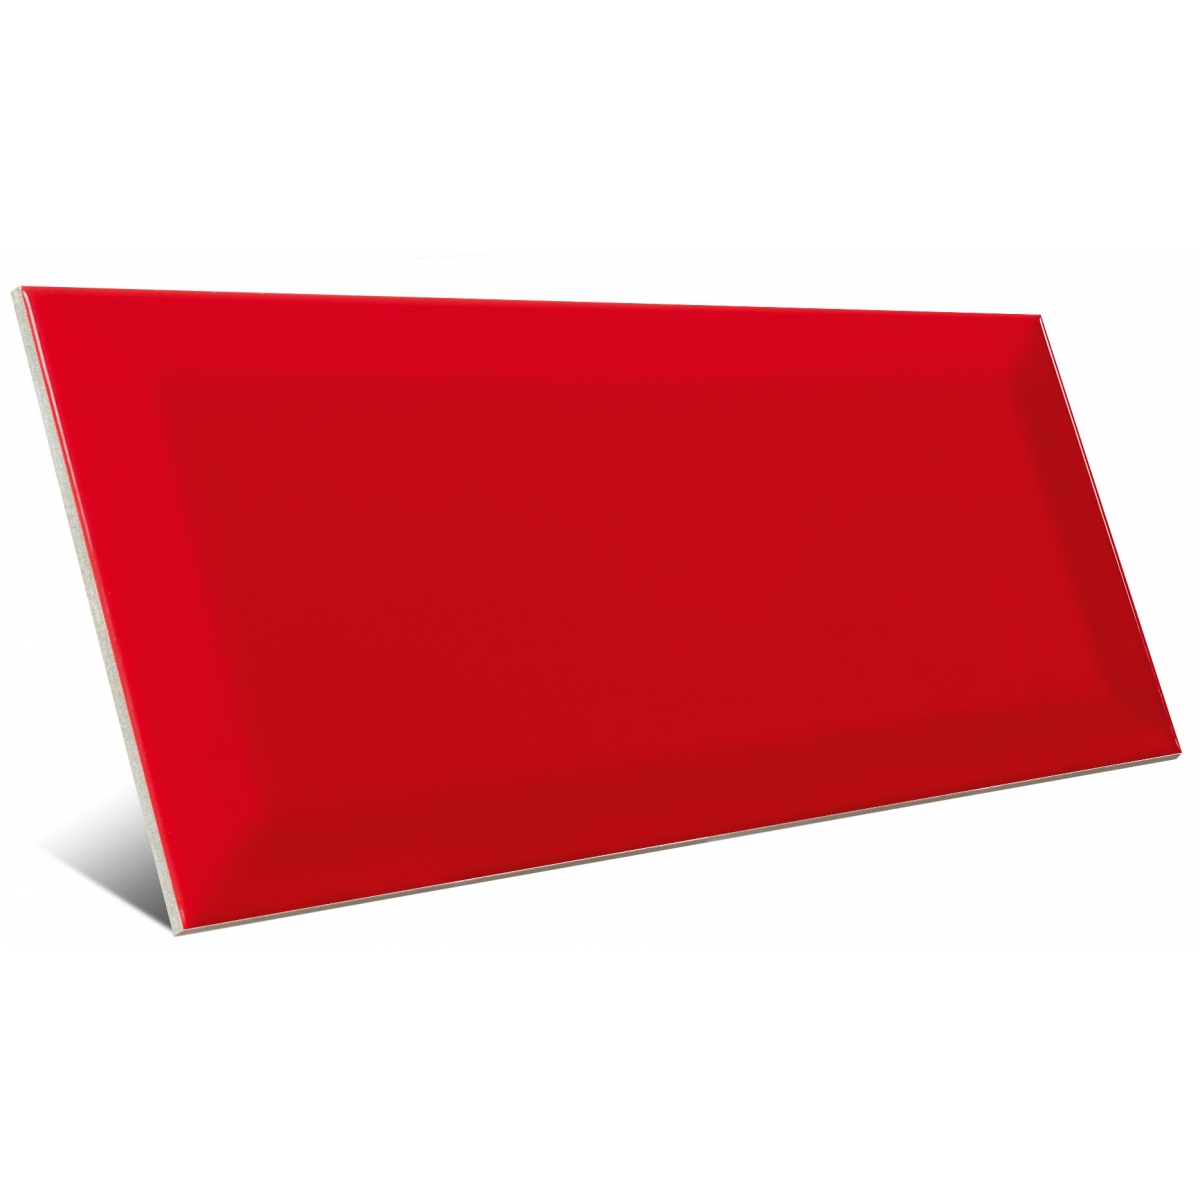 Bissel Rojo brillo 10x20 Mainzu